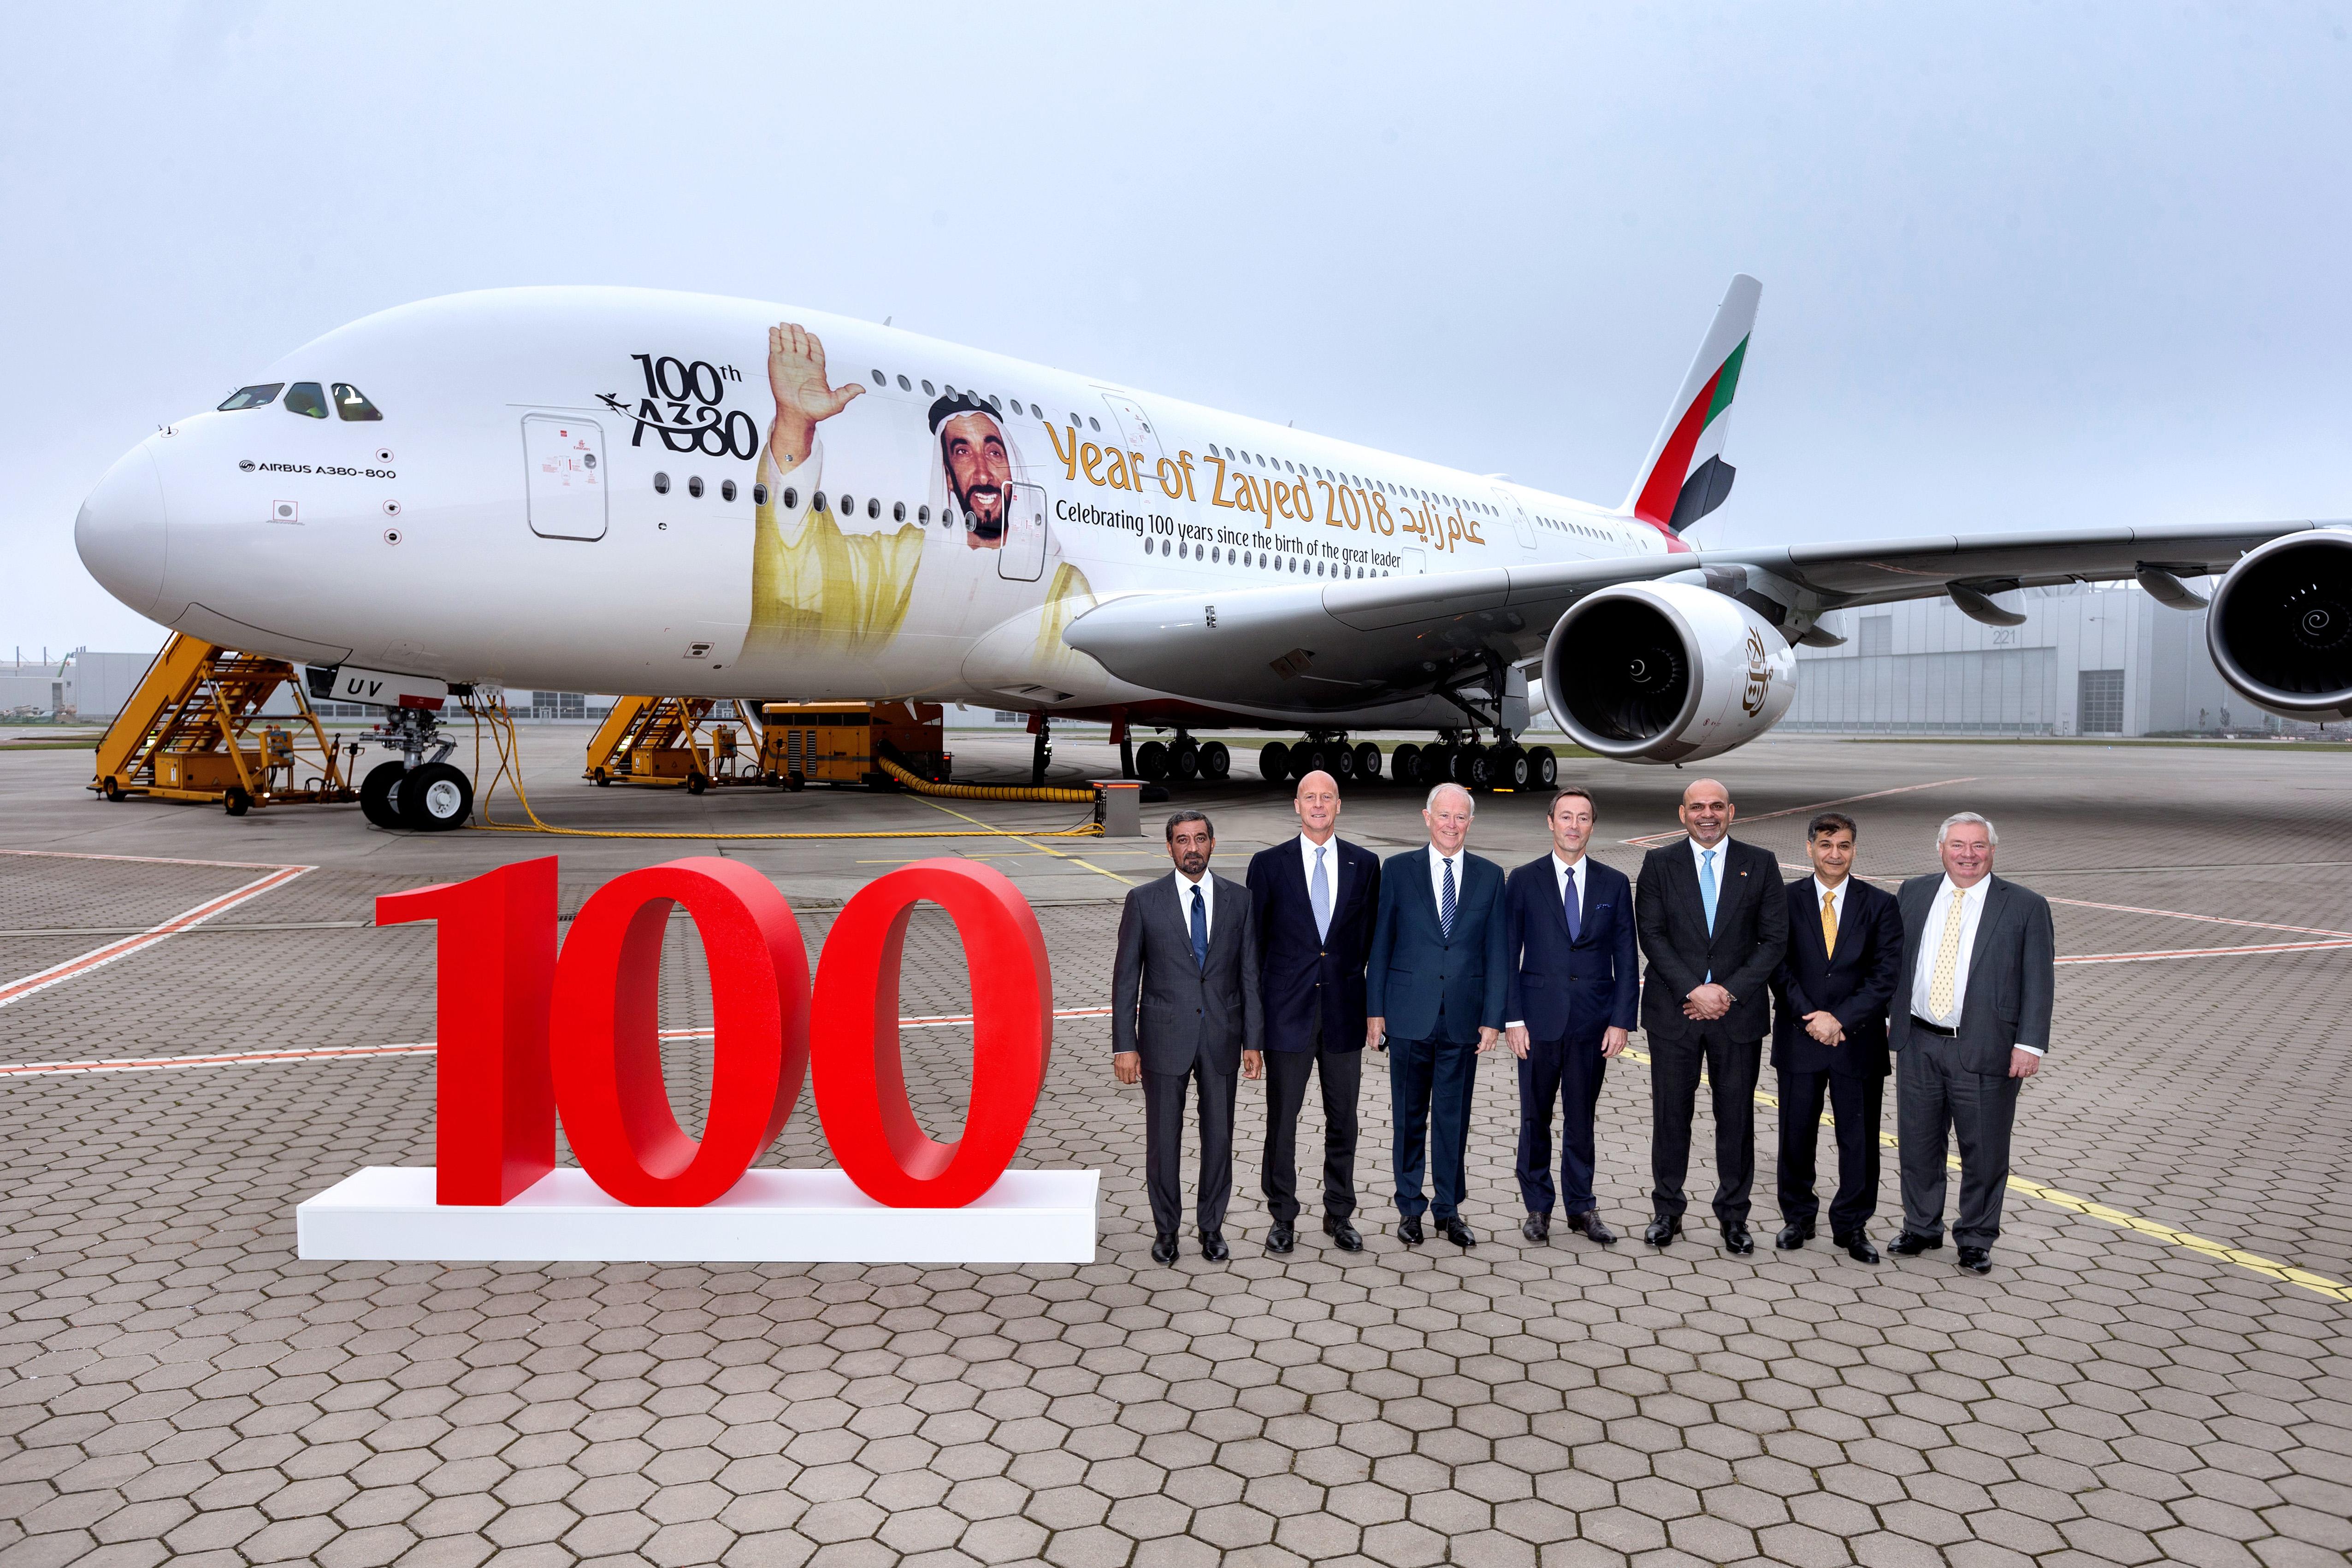 EMIRATES a380 HH Sheikh Zayed bin Sultan Al Nahyan